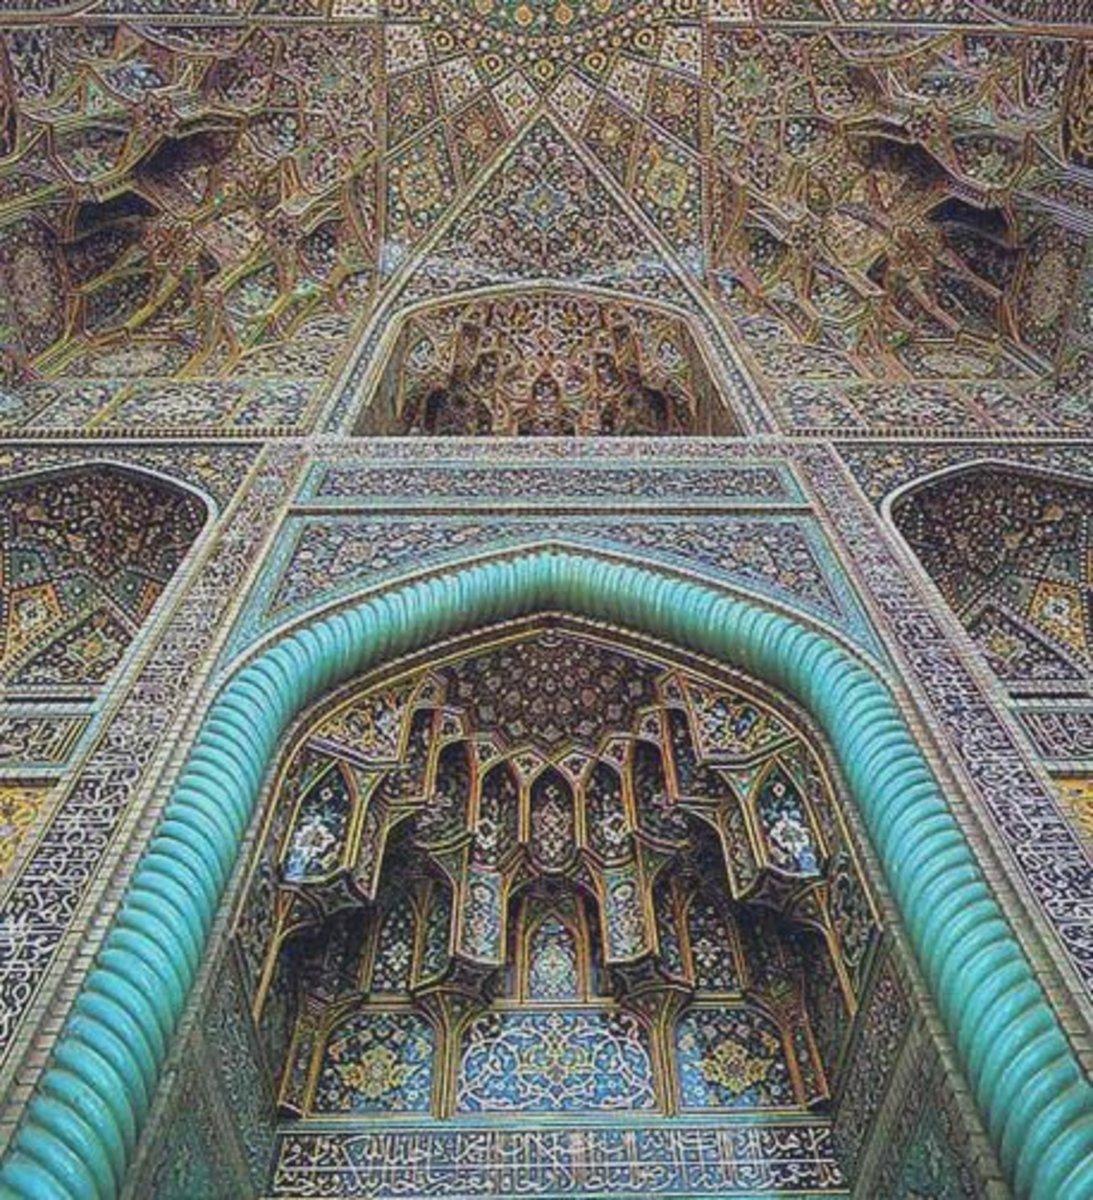 Some beautiful Timurid architecture.